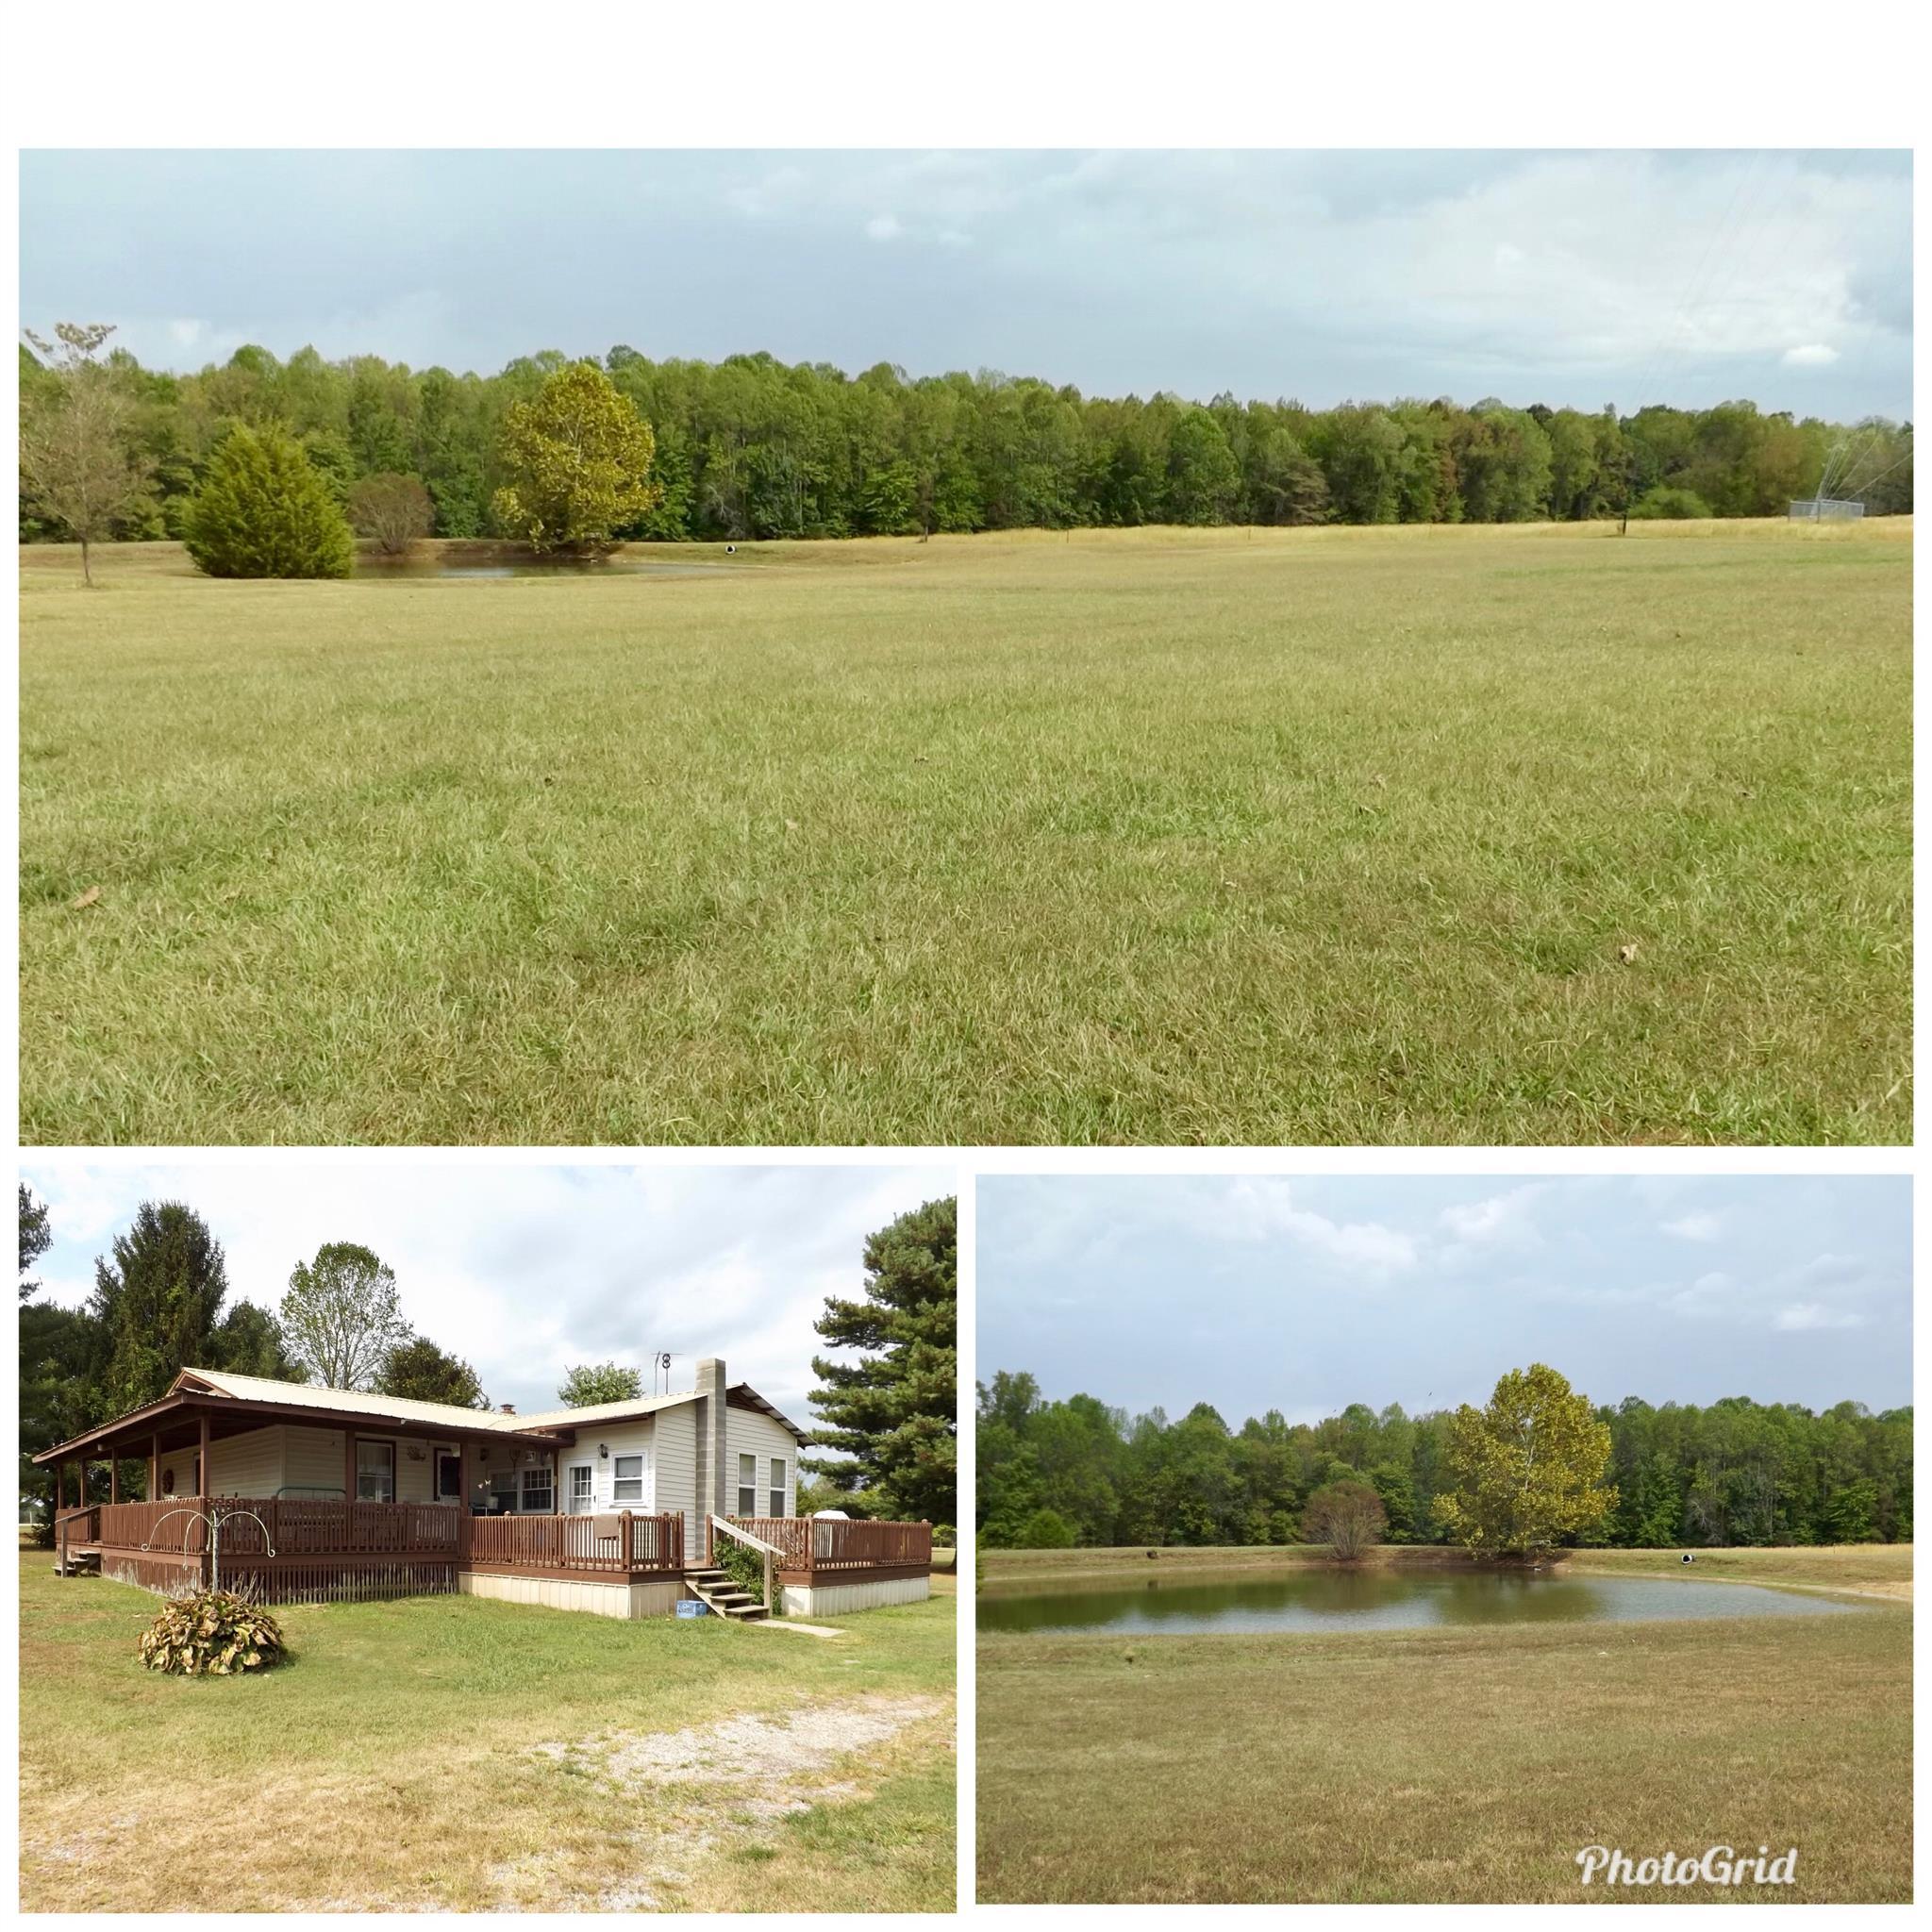 11751 Jim Cummings Hwy, Bradyville, TN 37026 - Bradyville, TN real estate listing